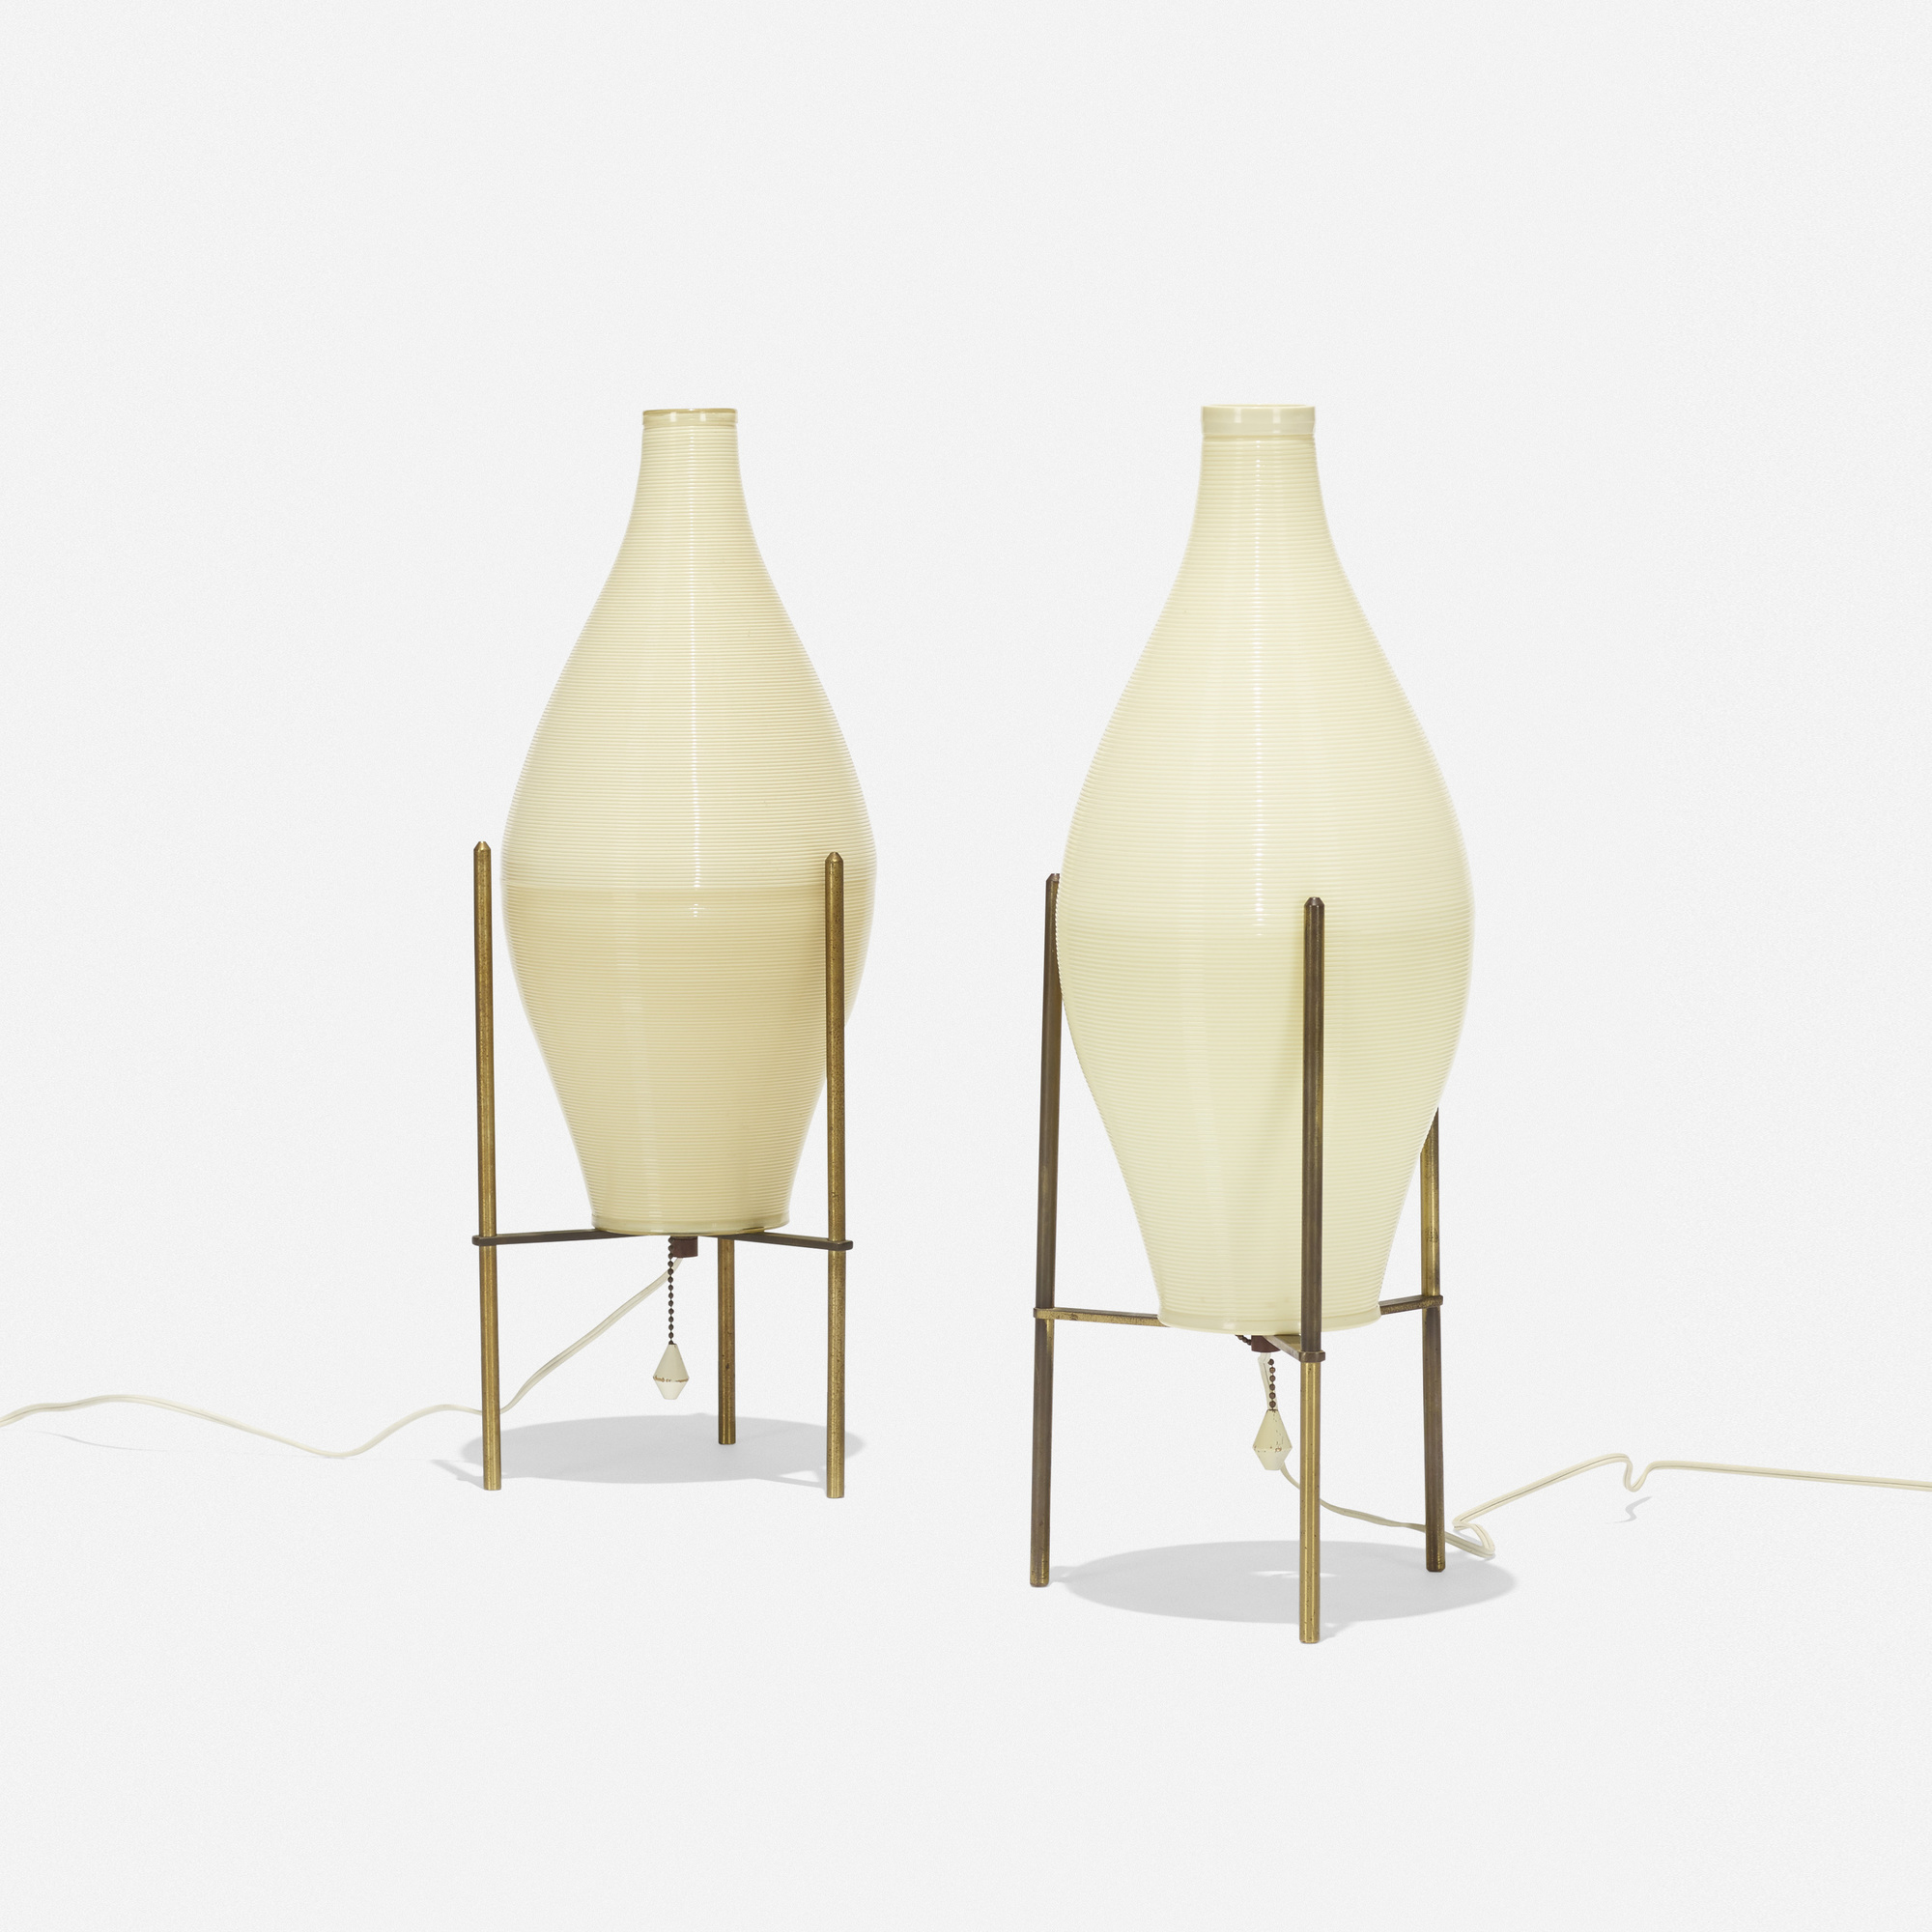 232: Yasha Heifetz / Rotaflex table lamps, pair (2 of 2)